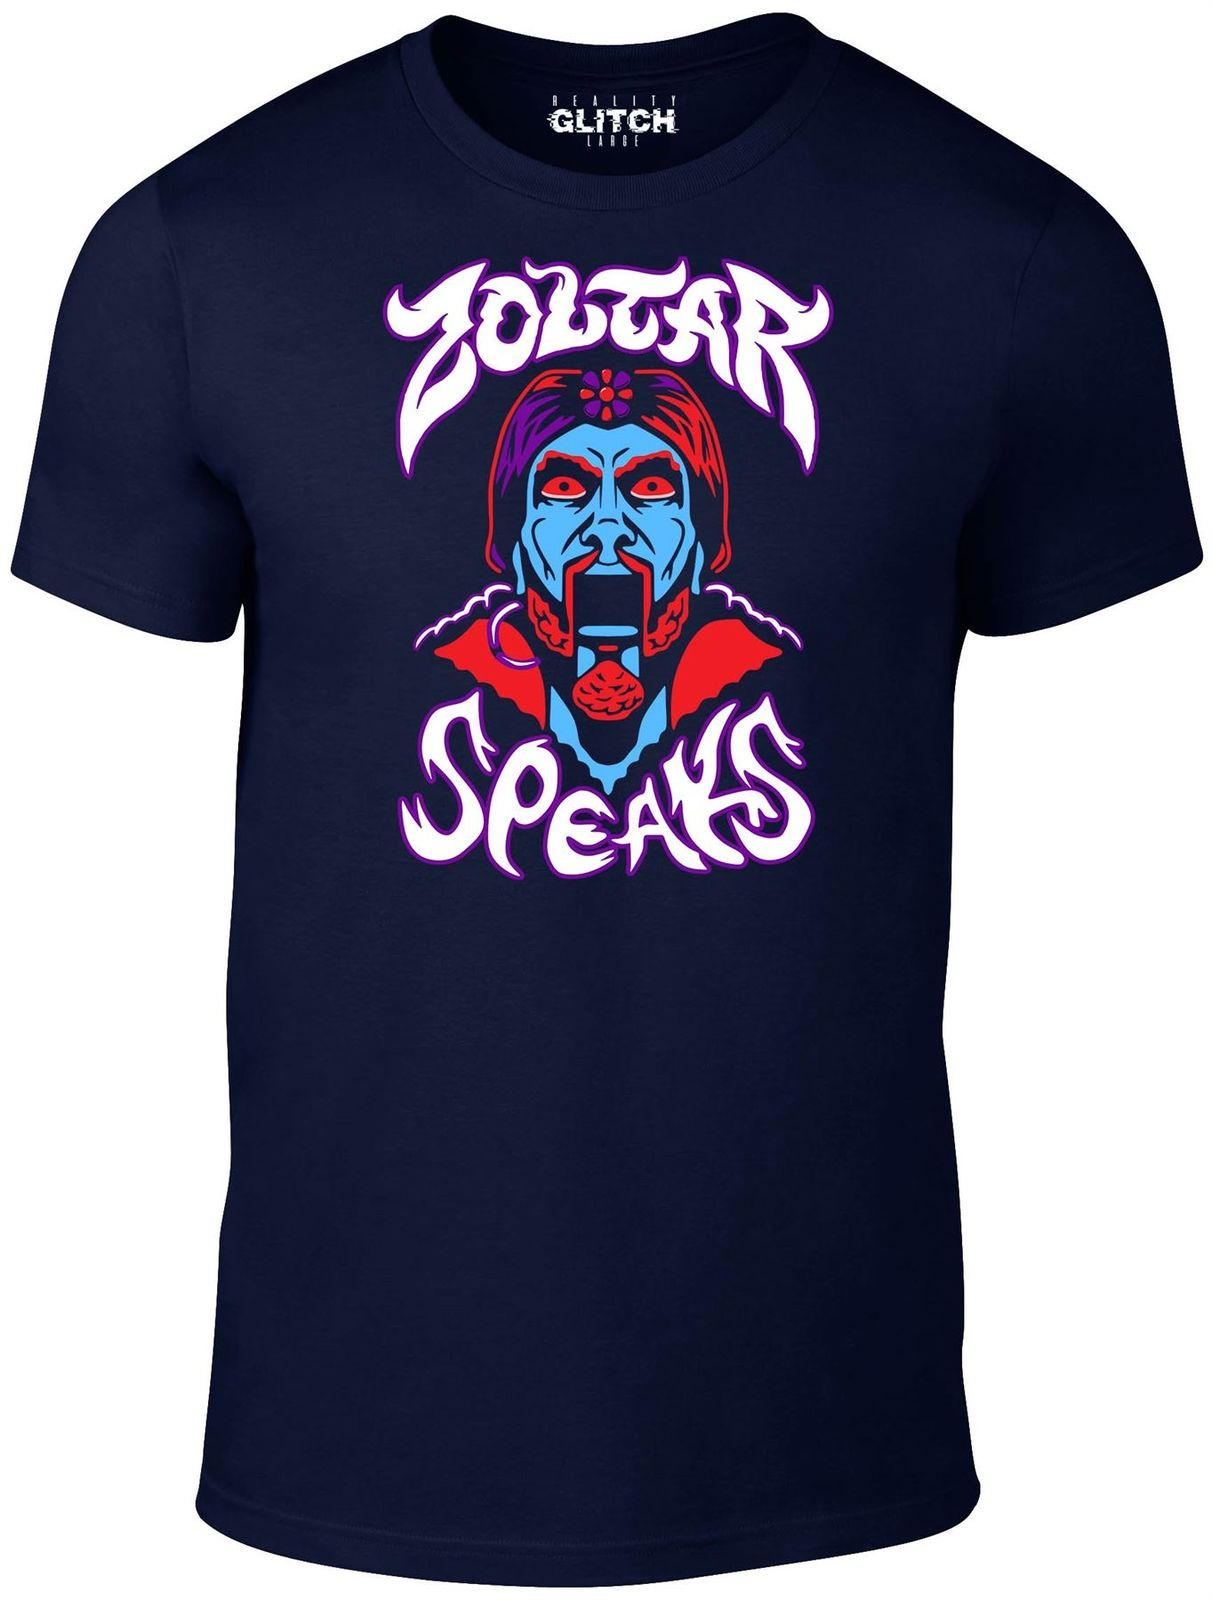 Reality Glitch hombres Zoltar Speaks camiseta Cool Casual pride camiseta hombres Unisex nueva moda camiseta envío gratis camisetas ajax